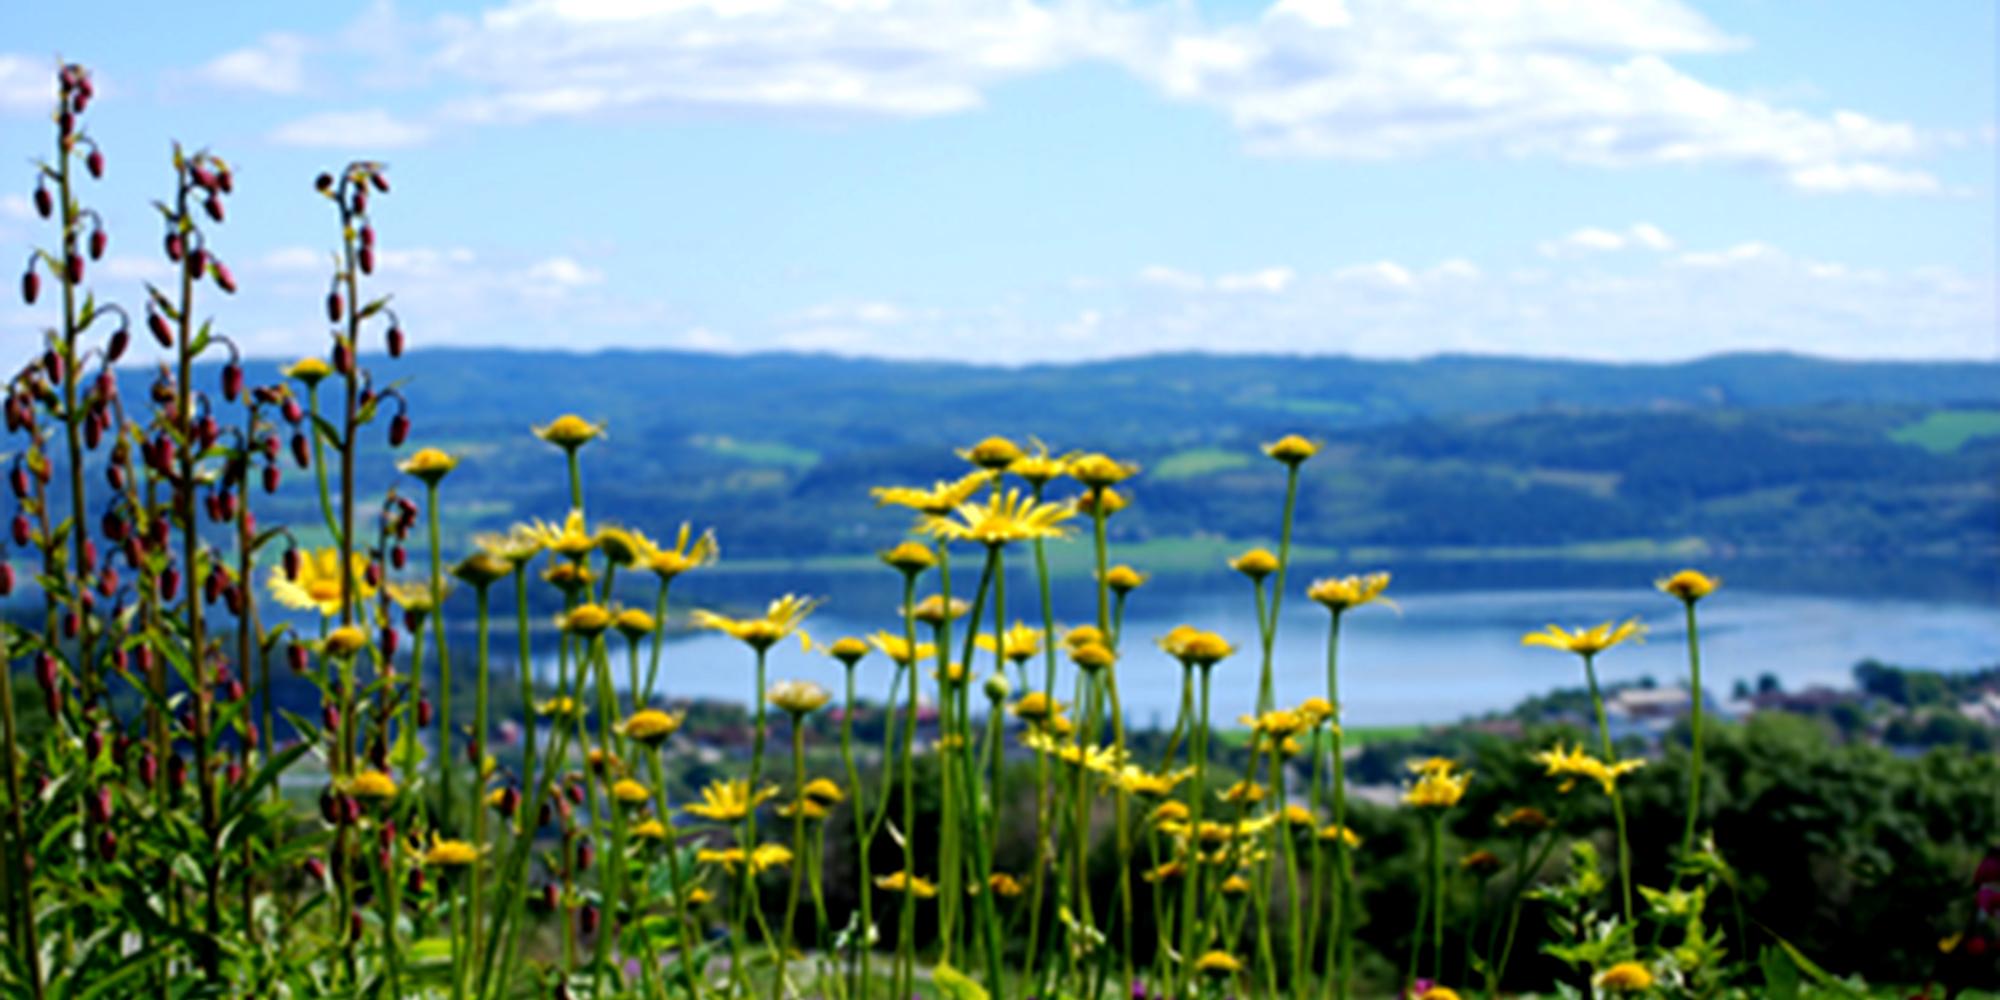 Husfrua Countyr Farm Hotel - flora with a view. Copyright: Husfrua Gårdshotell